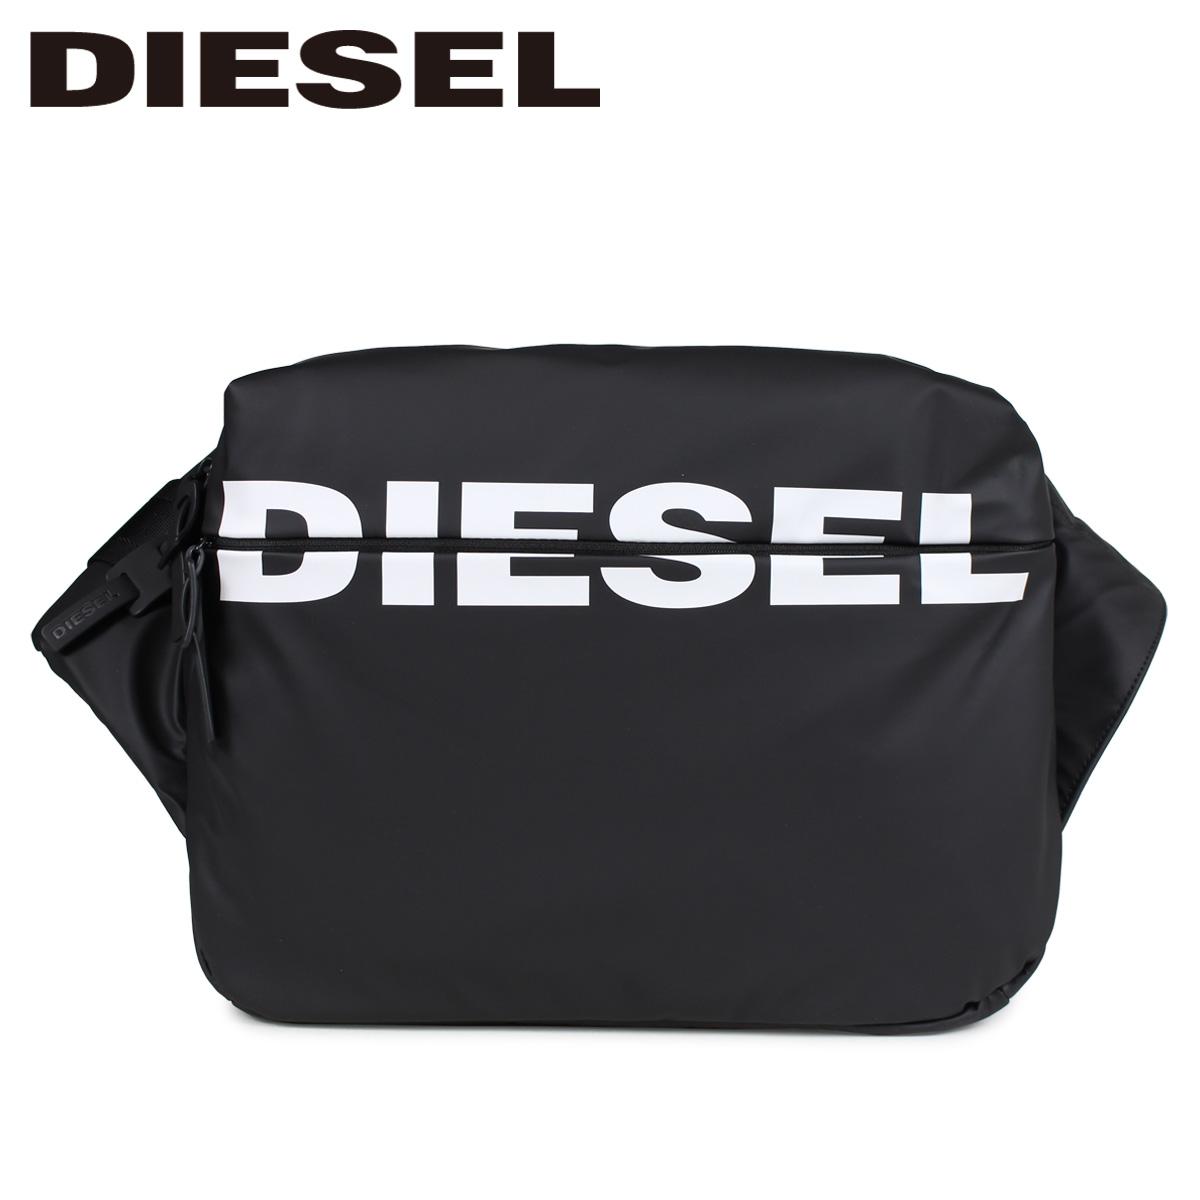 DIESEL F-BOLD CROSS ディーゼル バッグ ボディバッグ メンズ ブラック 黒 X05476 P1705 [4/15 再入荷]